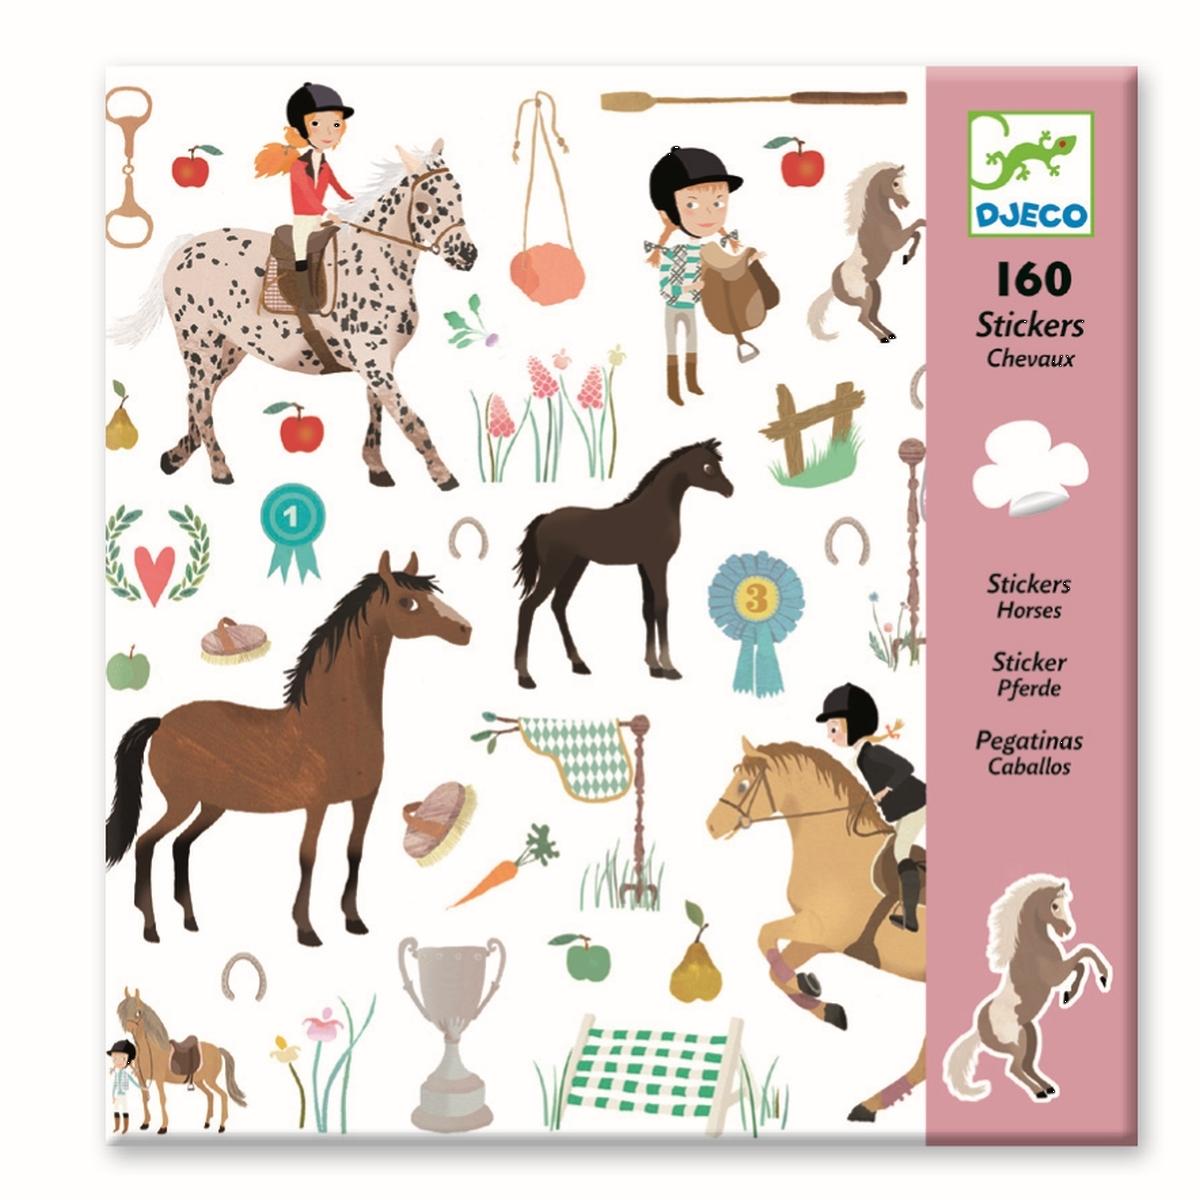 160 Pferde Sticker